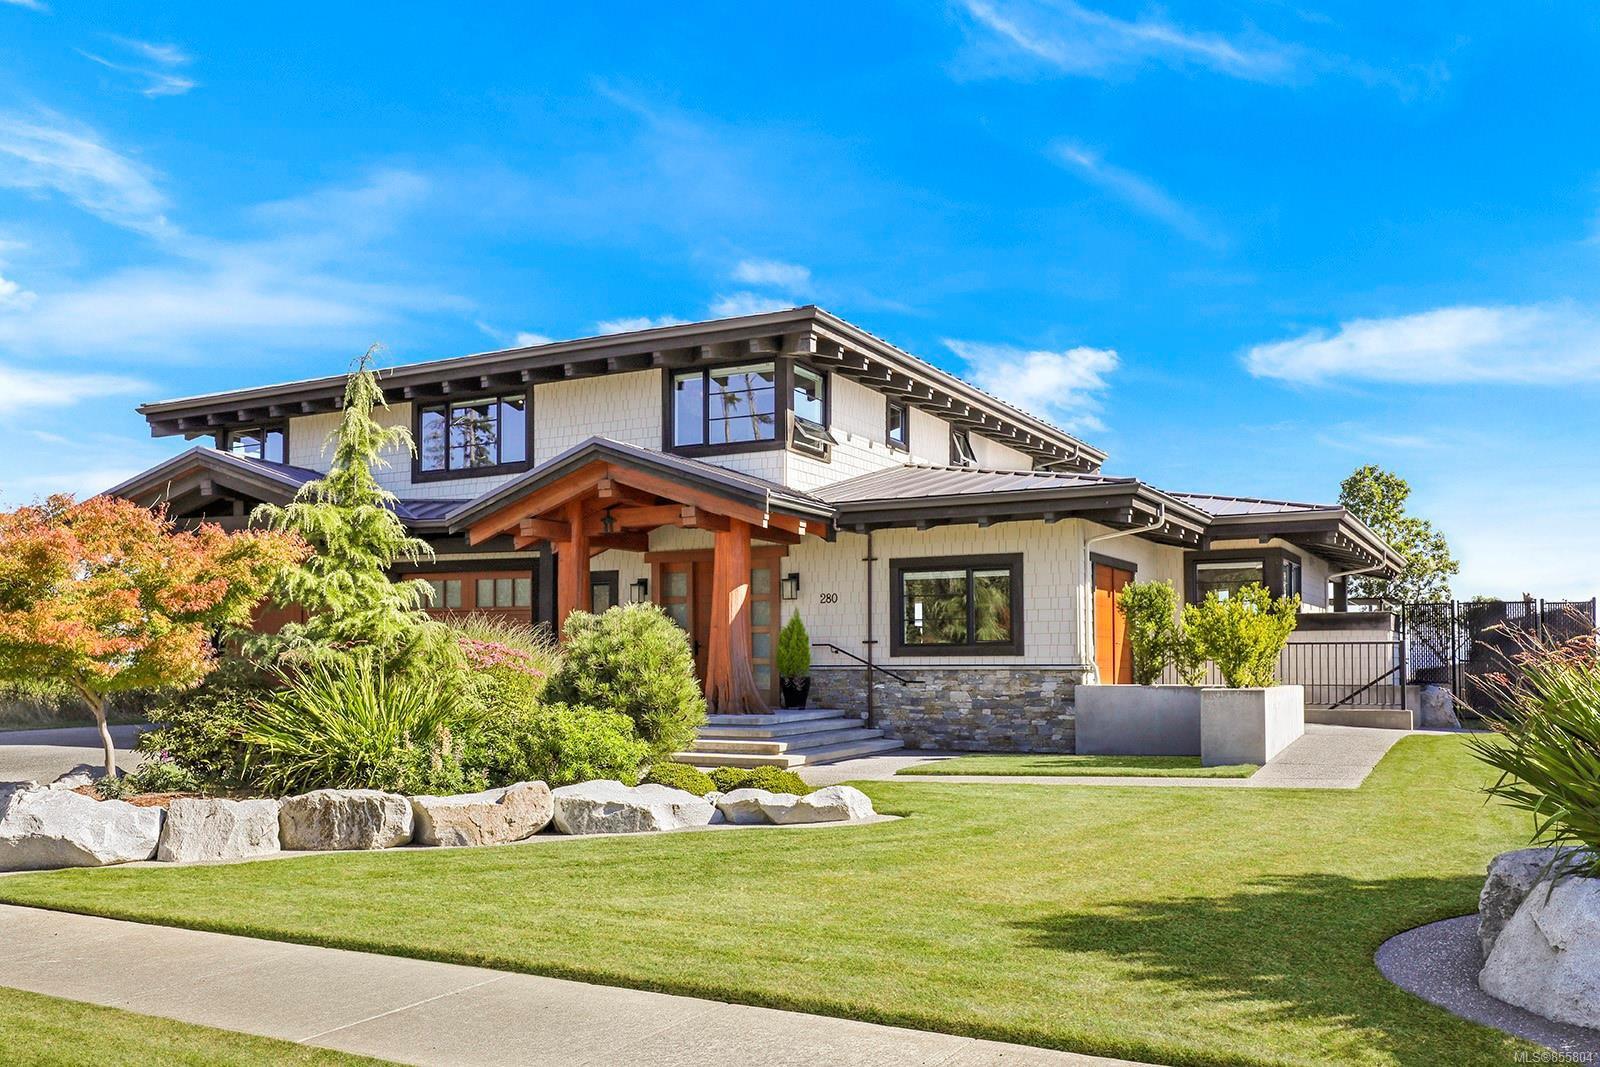 Main Photo: 280 Connemara Rd in : CV Comox Peninsula House for sale (Comox Valley)  : MLS®# 855804